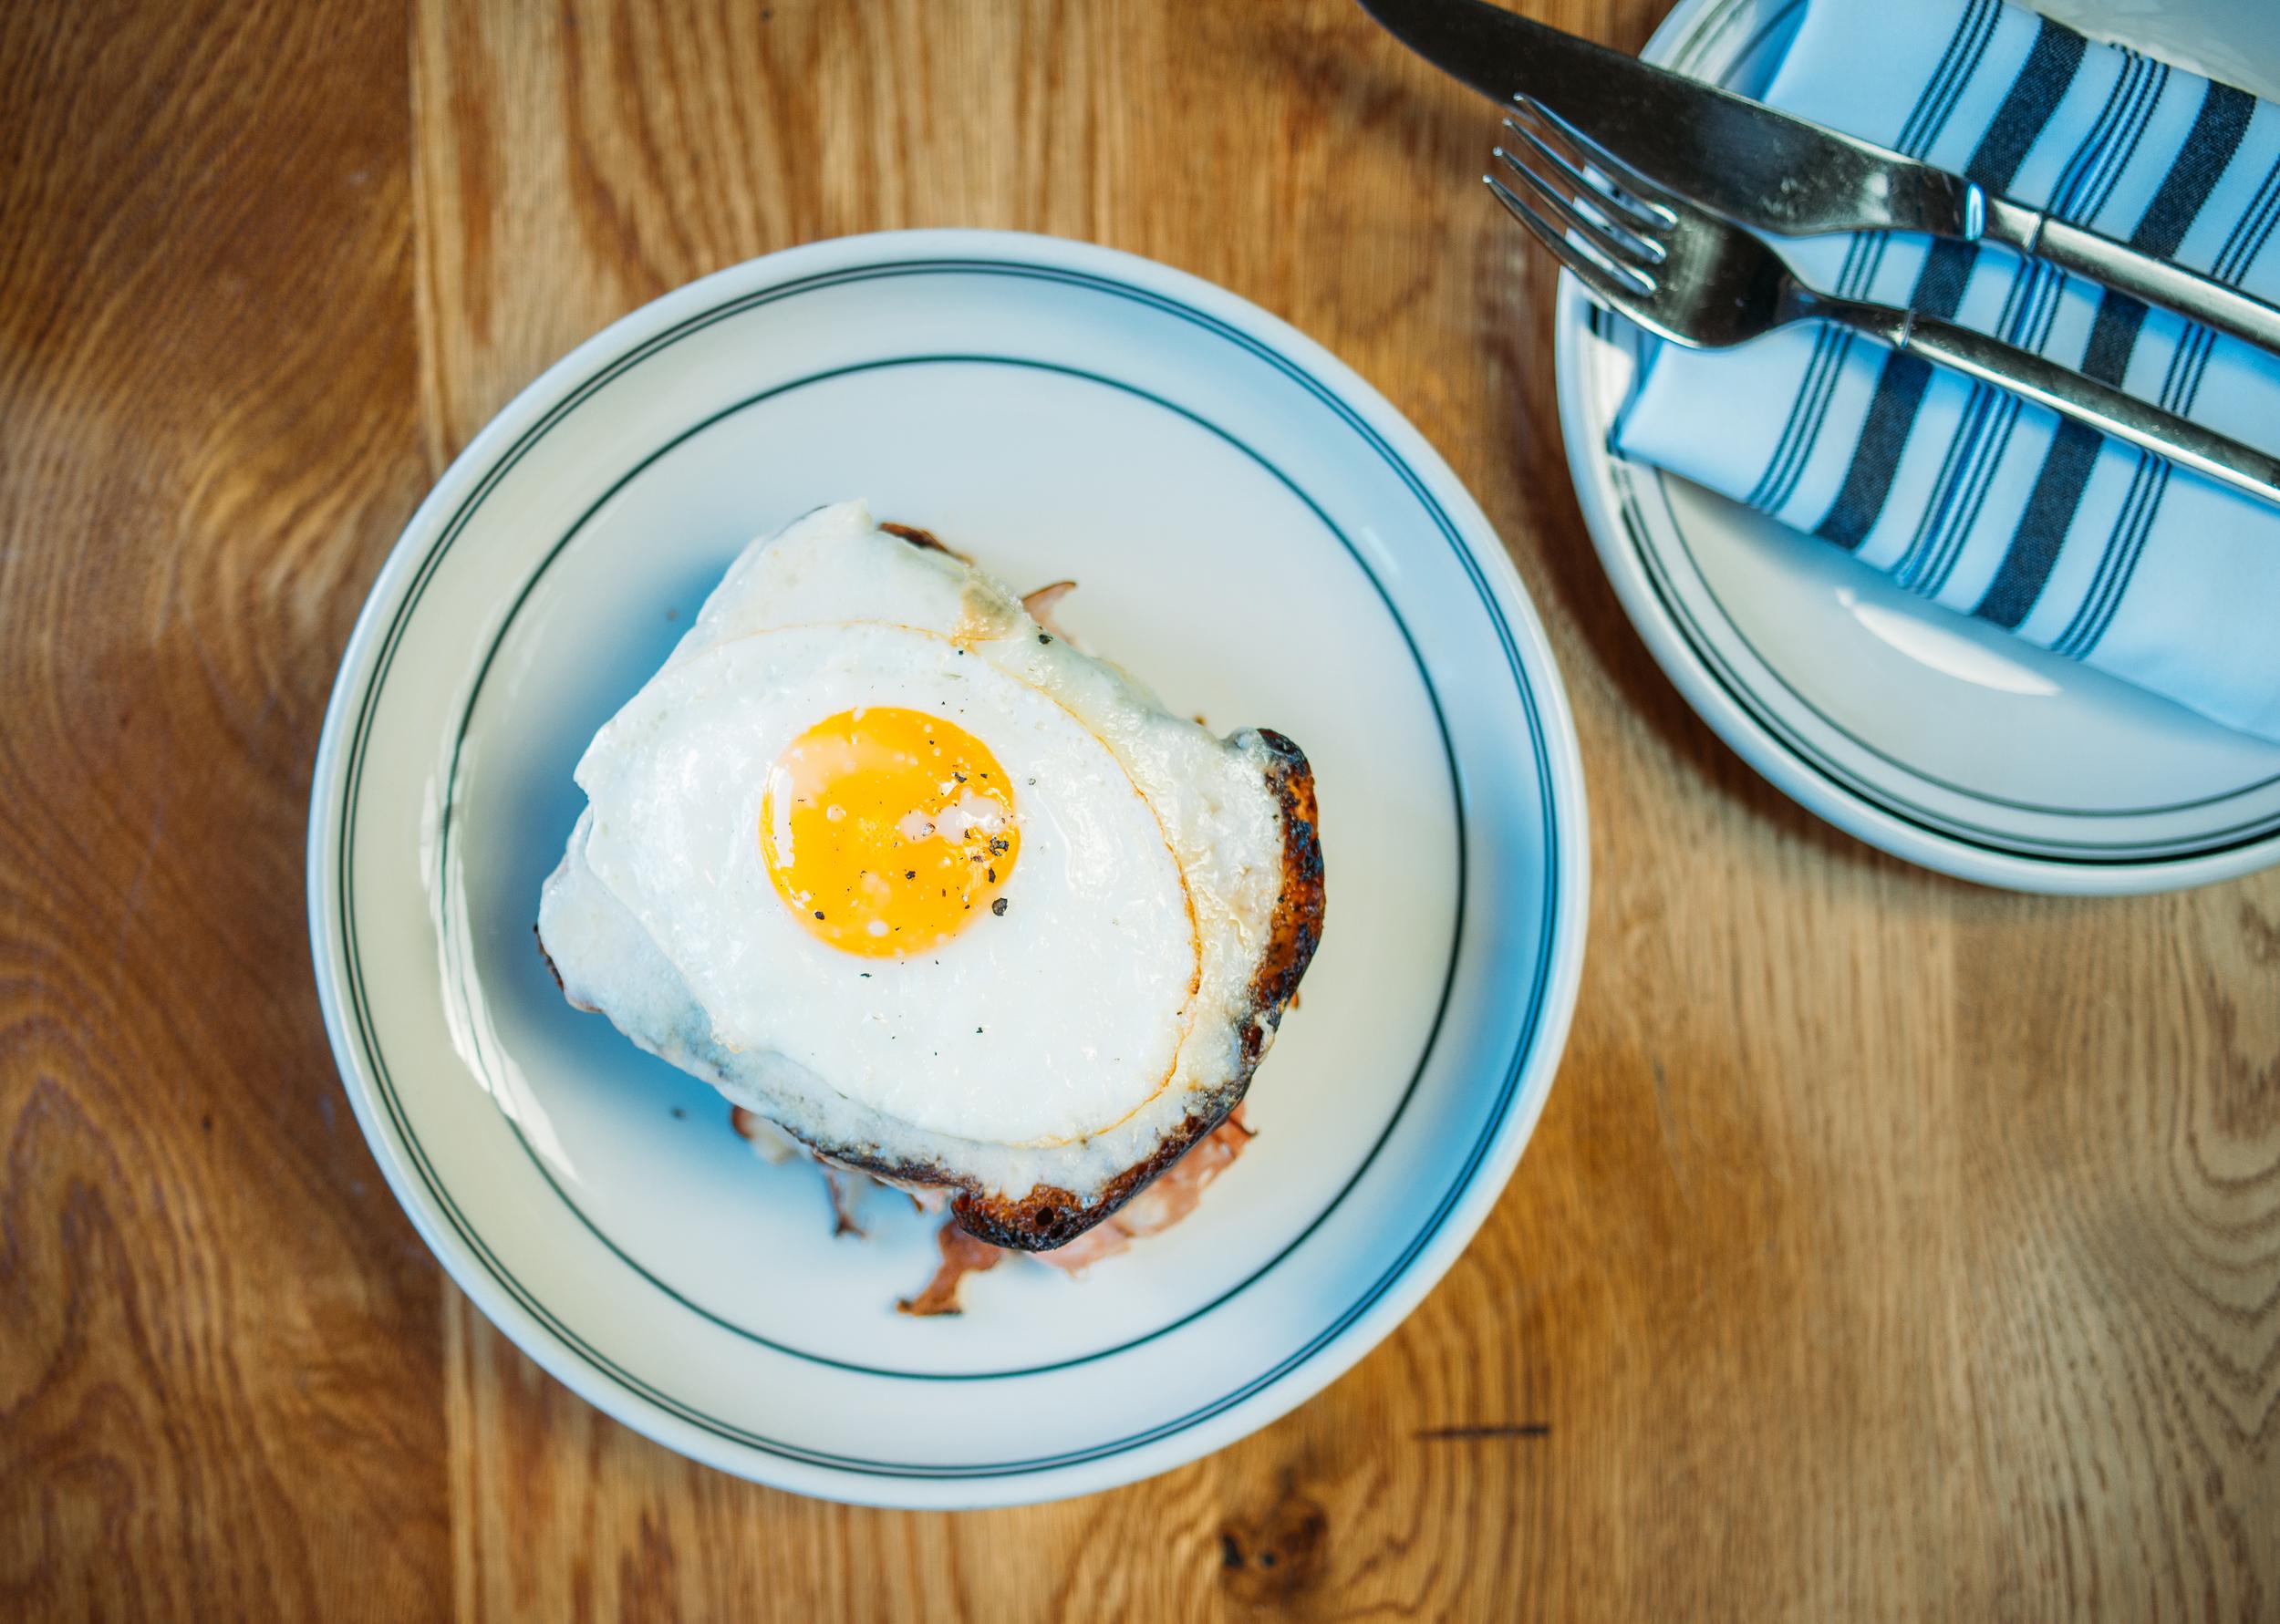 Croque madame, smoked ham, béchamel, gruyere & sunny egg.